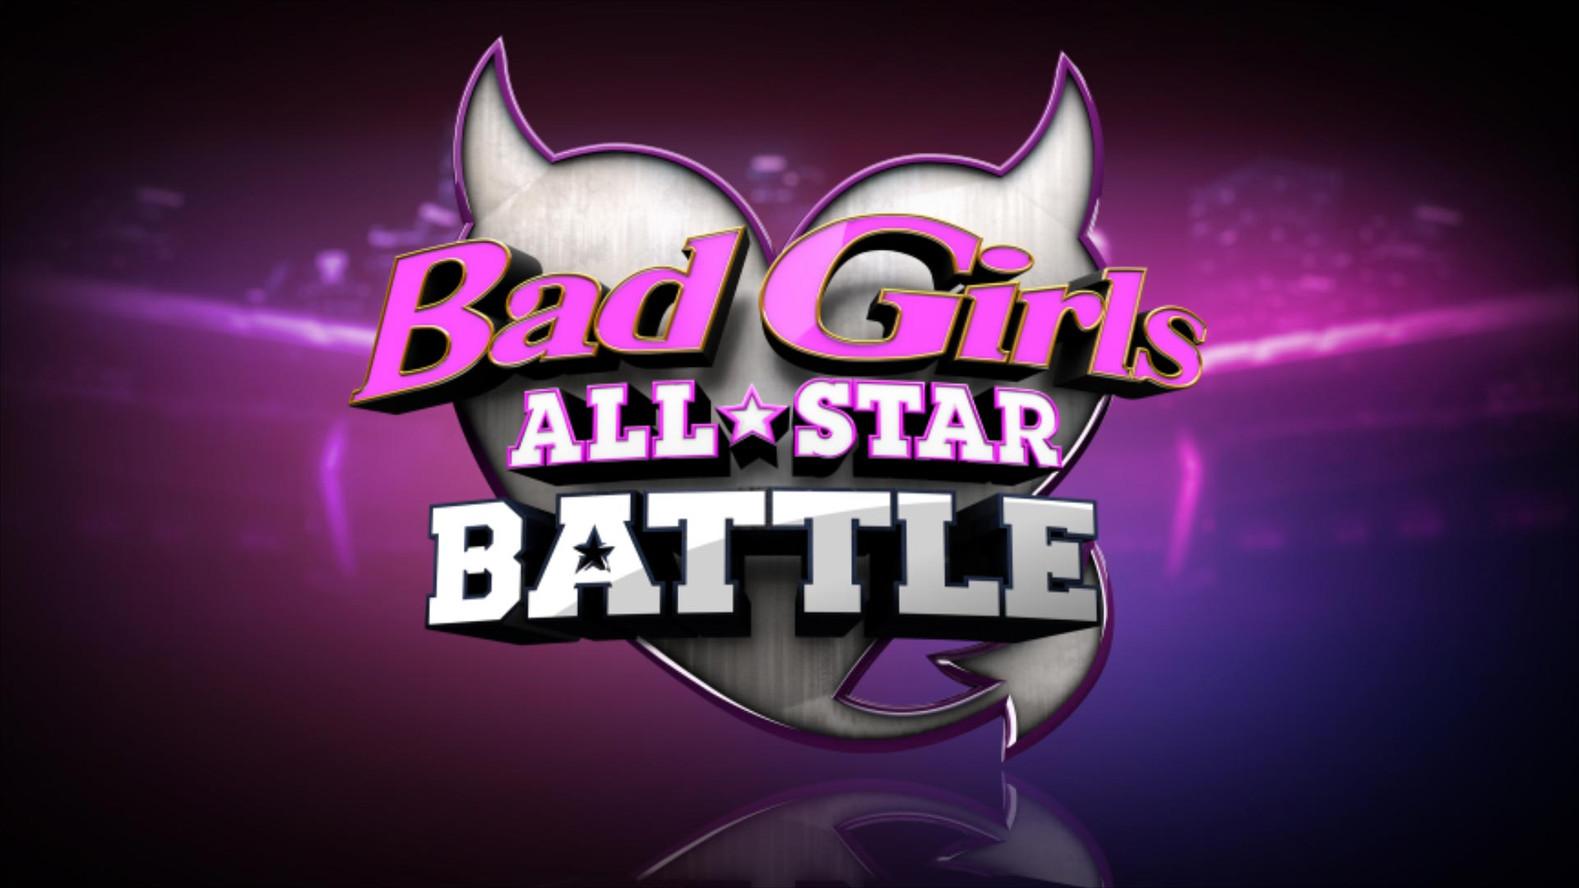 badgirls_logo.jpg